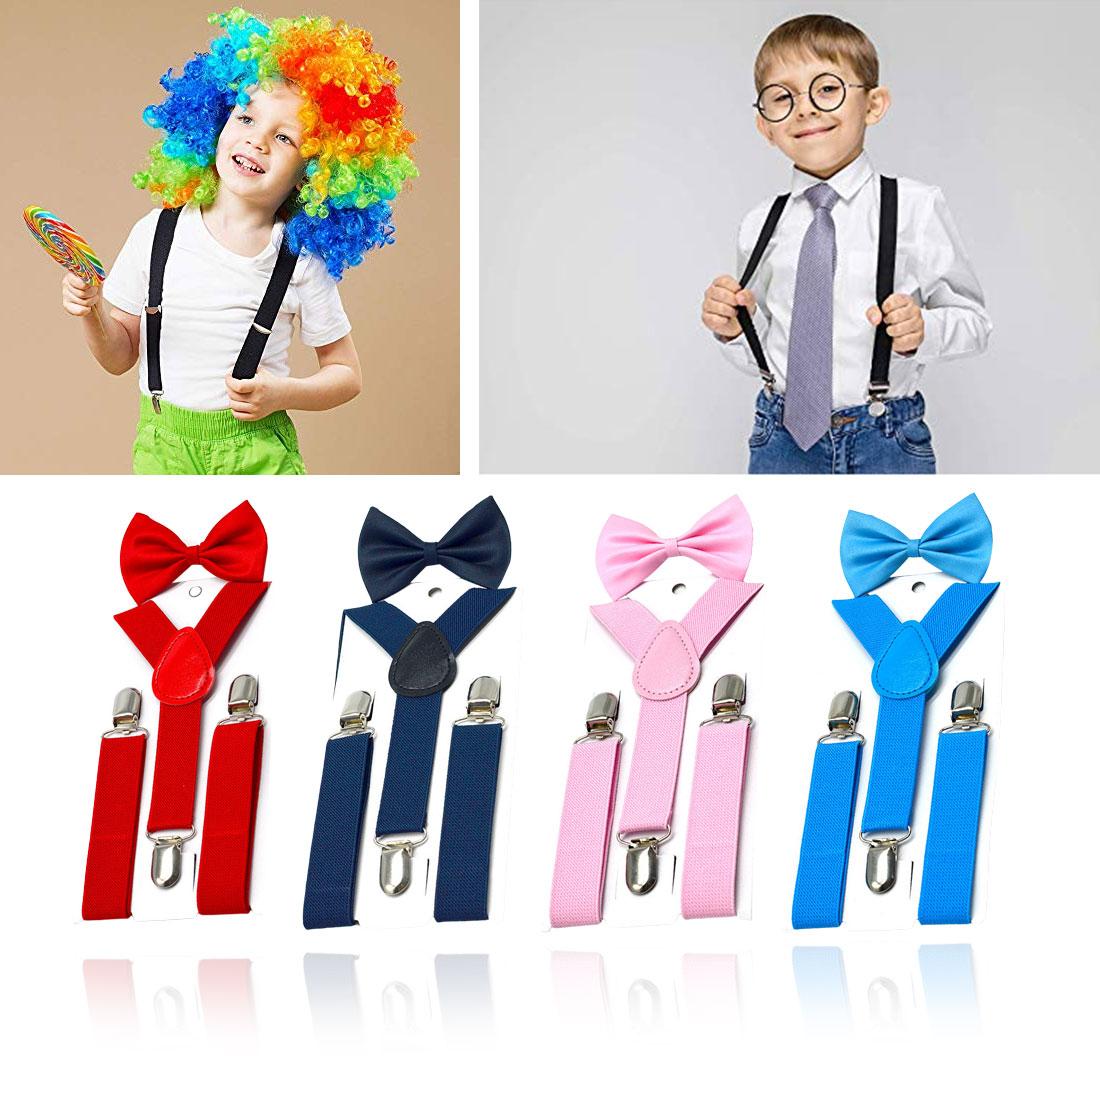 Adjustable Child Kid Elastic Suspender And Cool Bow Tie Matching Tuxedo Brace Belt For Boys Girls Children Costume Accessories